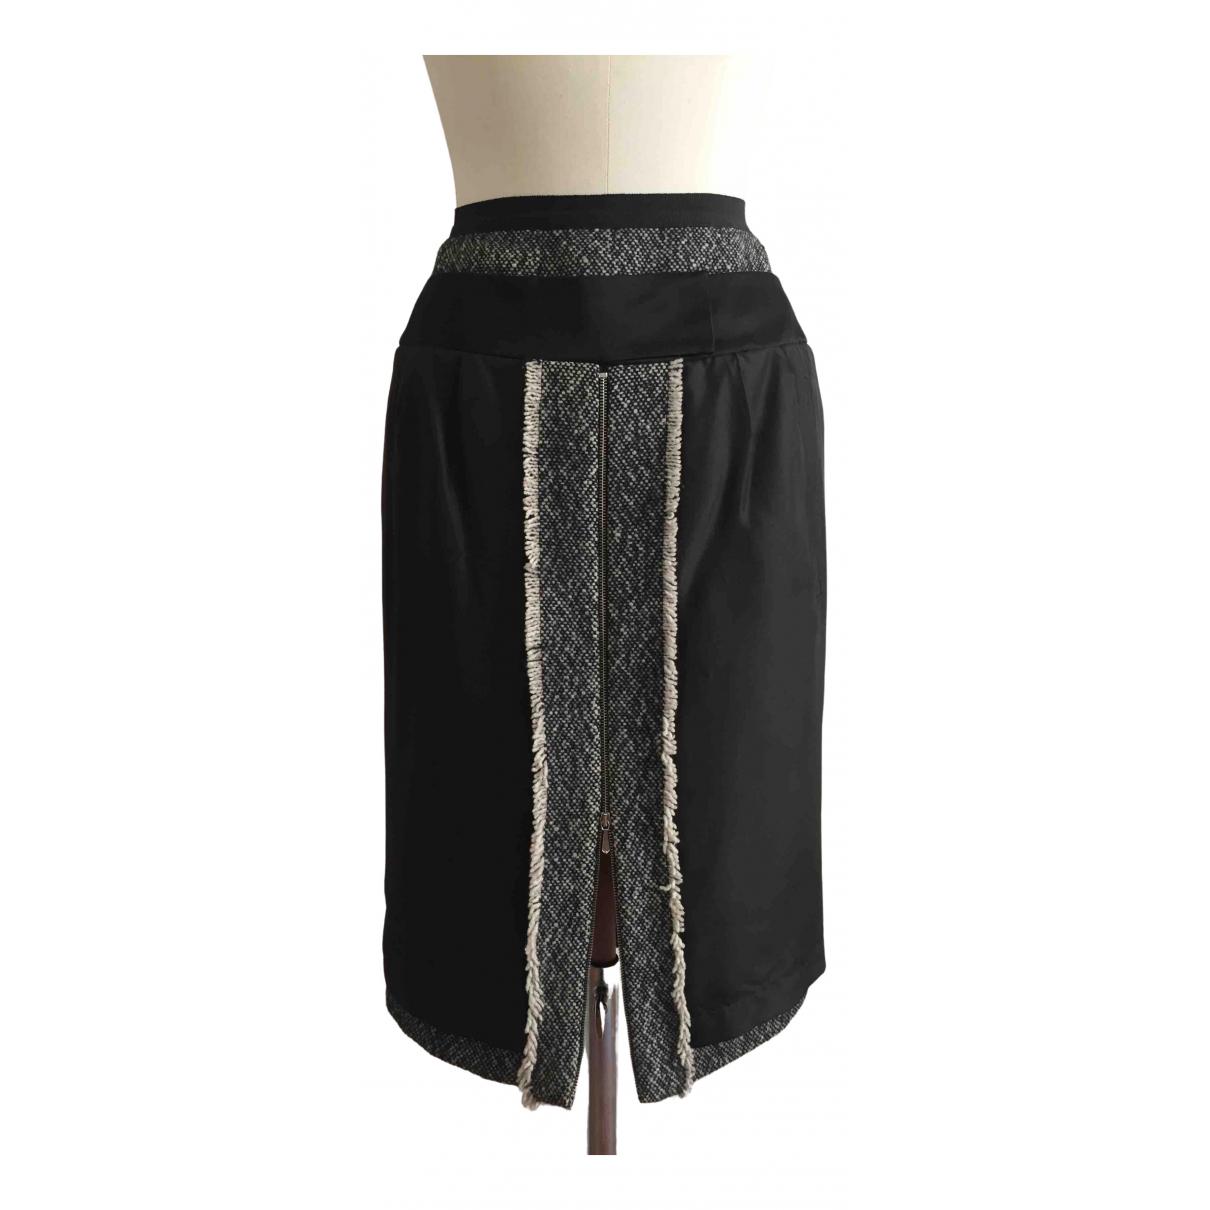 Givenchy \N Black Wool skirt for Women 38 FR